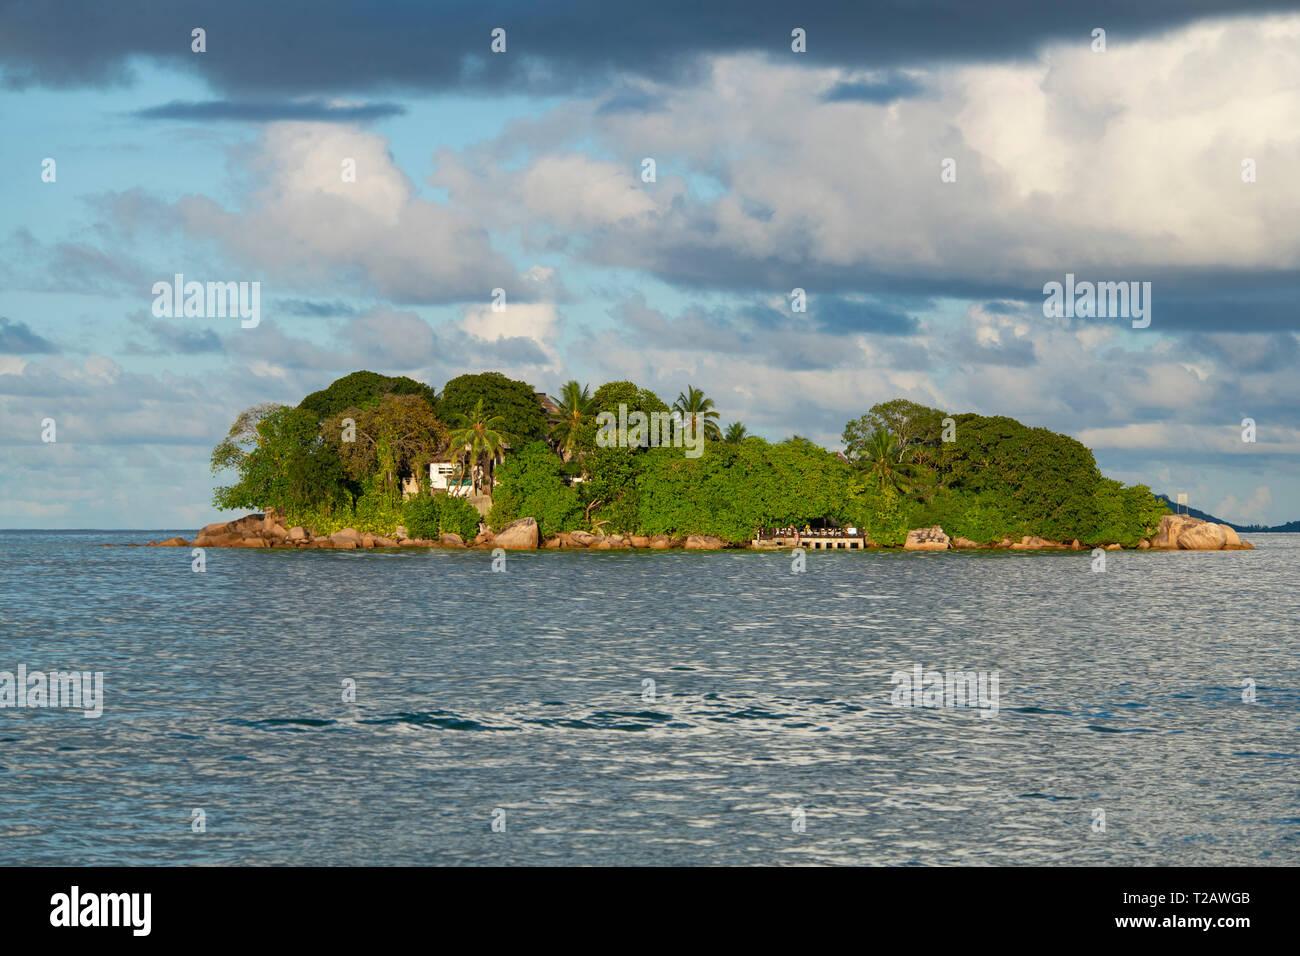 Chauve Souris island off the coast of Praslin, the Seychelles Stock Photo